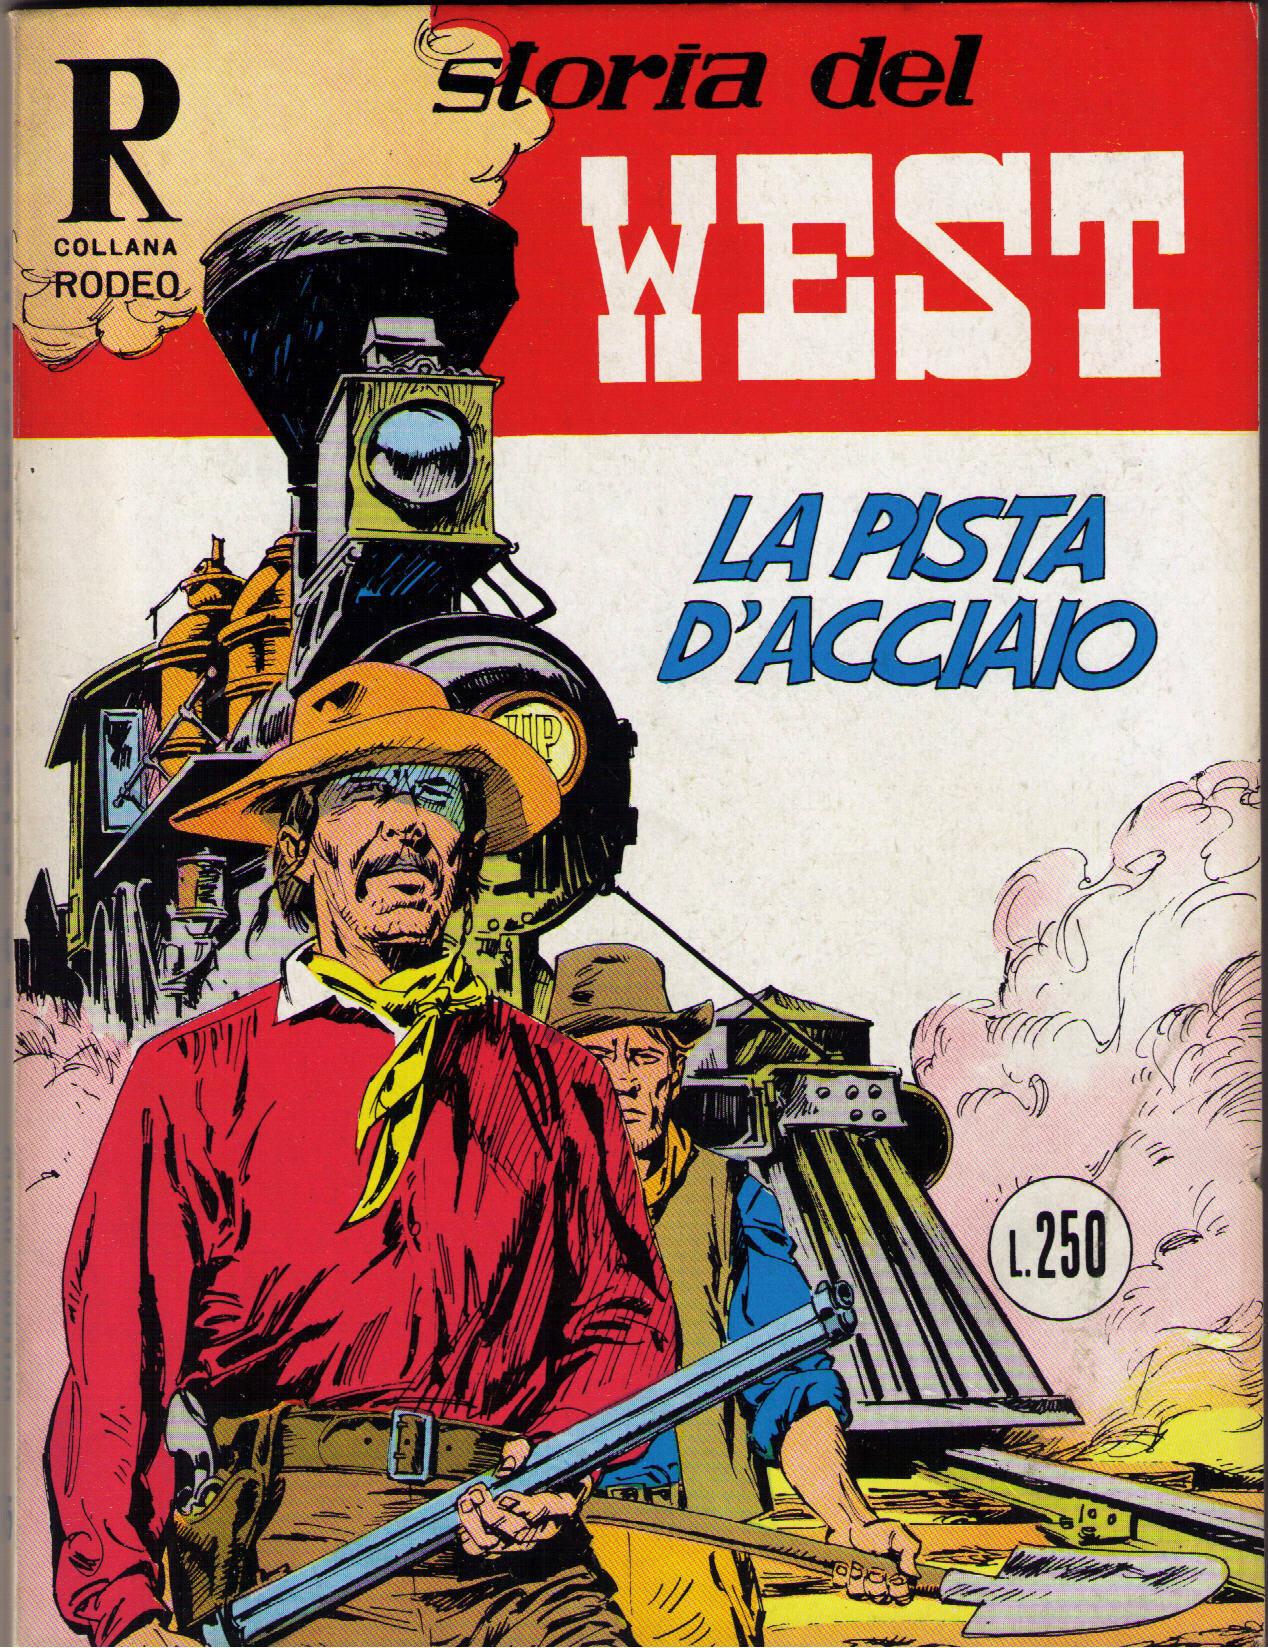 Storia del West n.33 (collana Rodeo n.75)